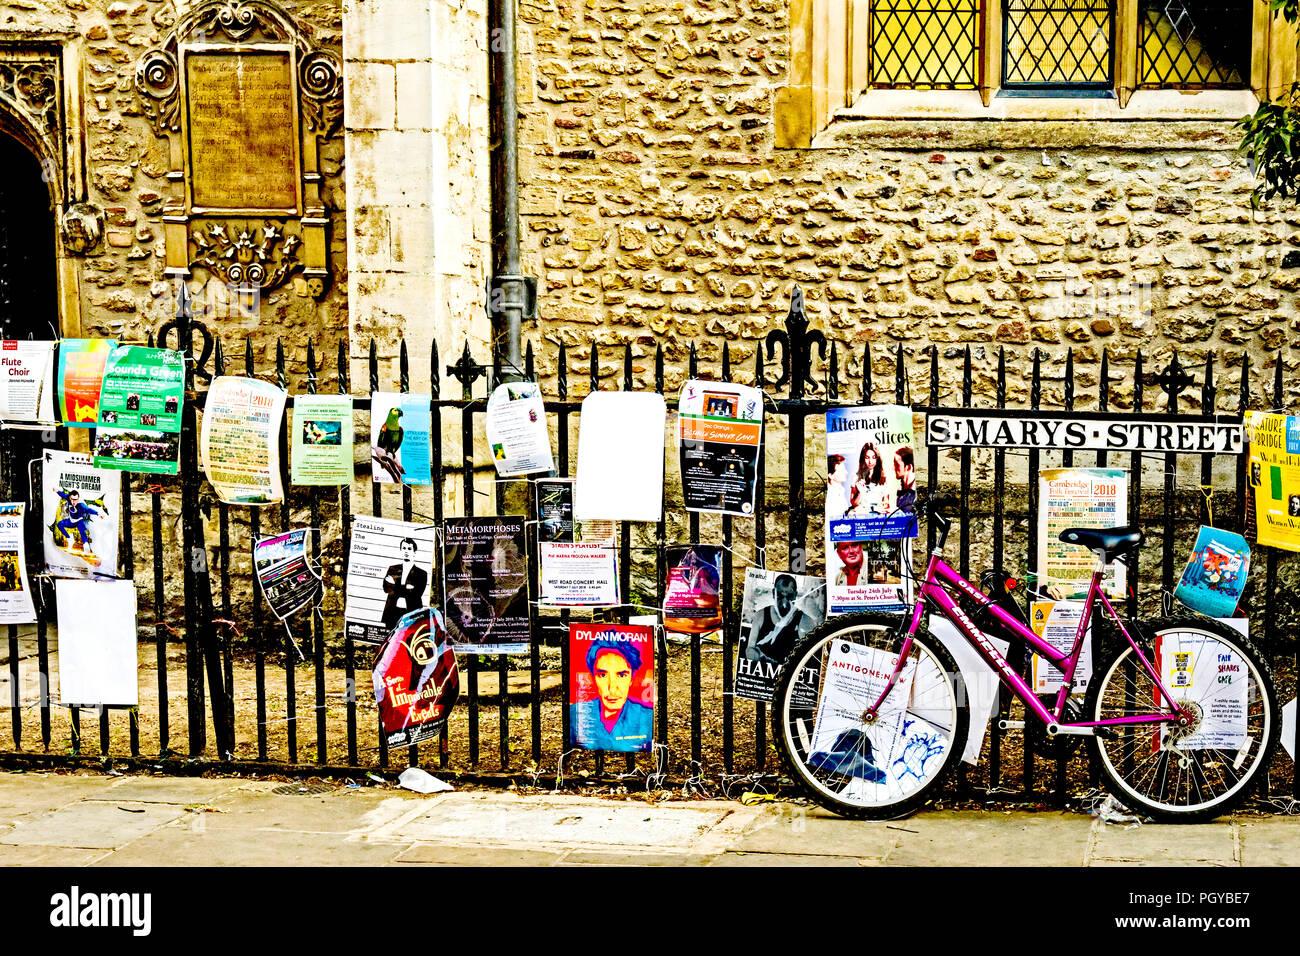 Cambridge (England, Great Britain): Advertisements for students; Werbung für Studenten - Stock Image